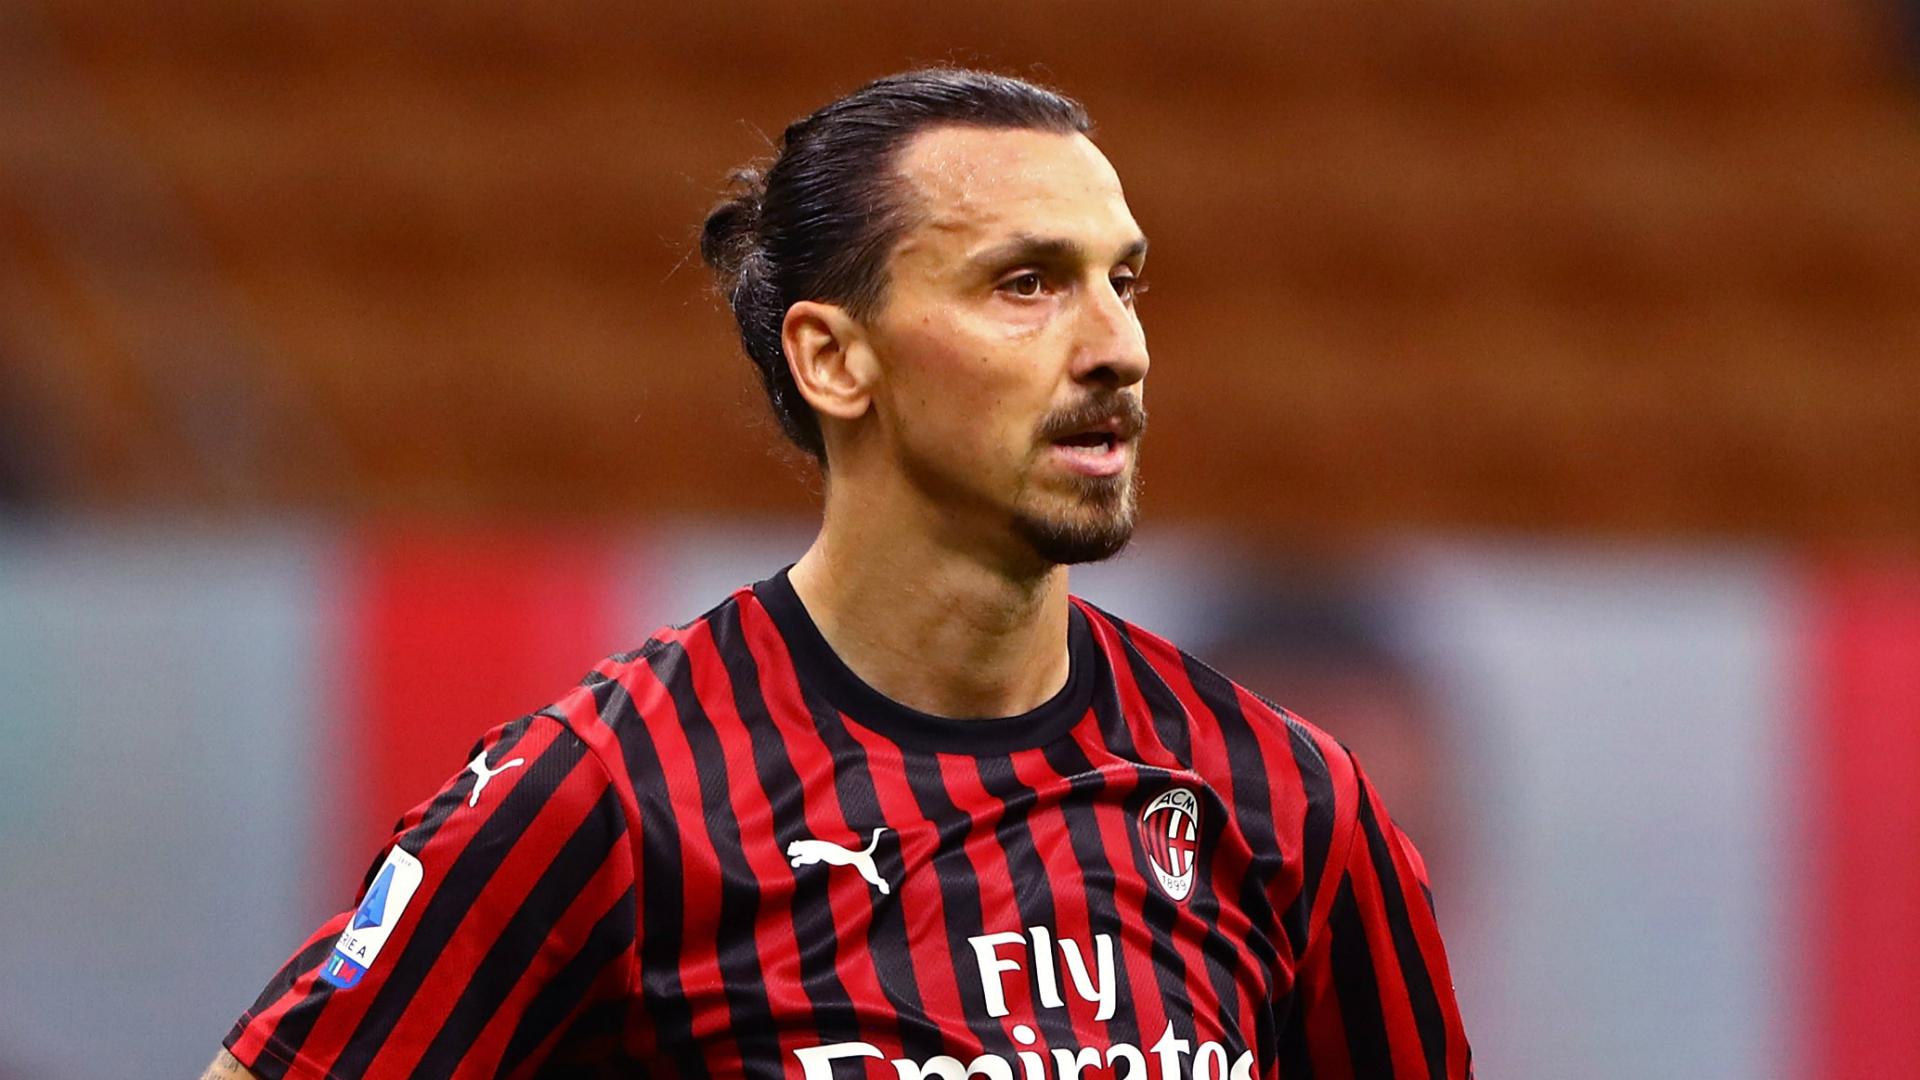 'Ibra has improved us in many ways' - Milan boss Pioli praises veteran's impact on Serie A side